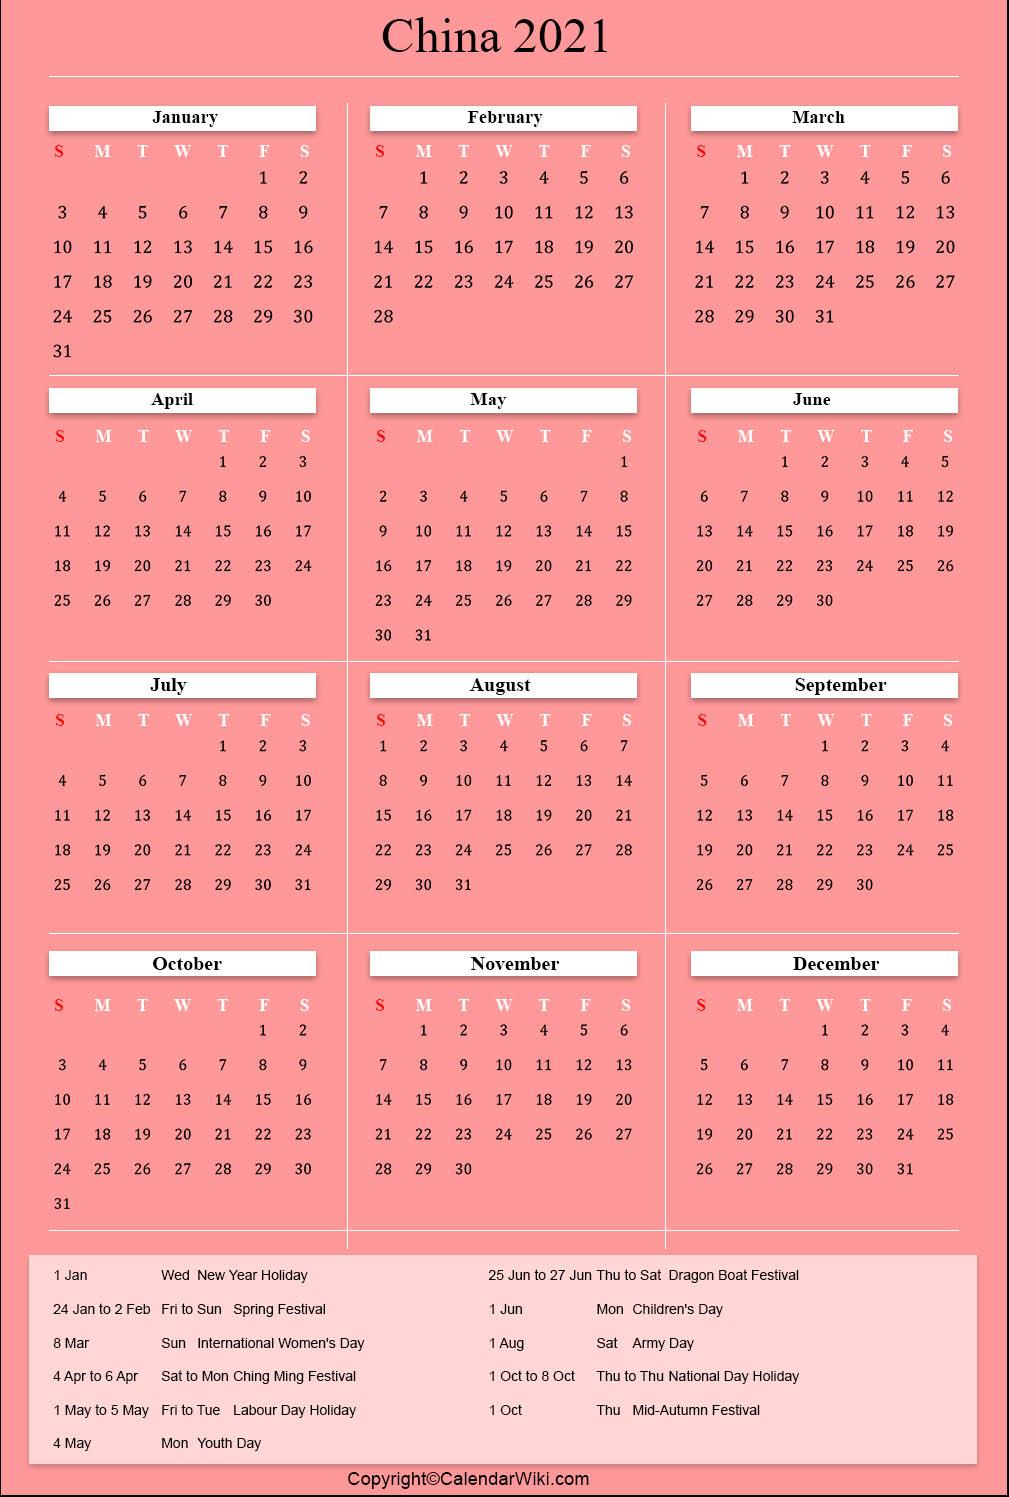 Printable China Calendar 2021 With Holidays [Public Holidays]